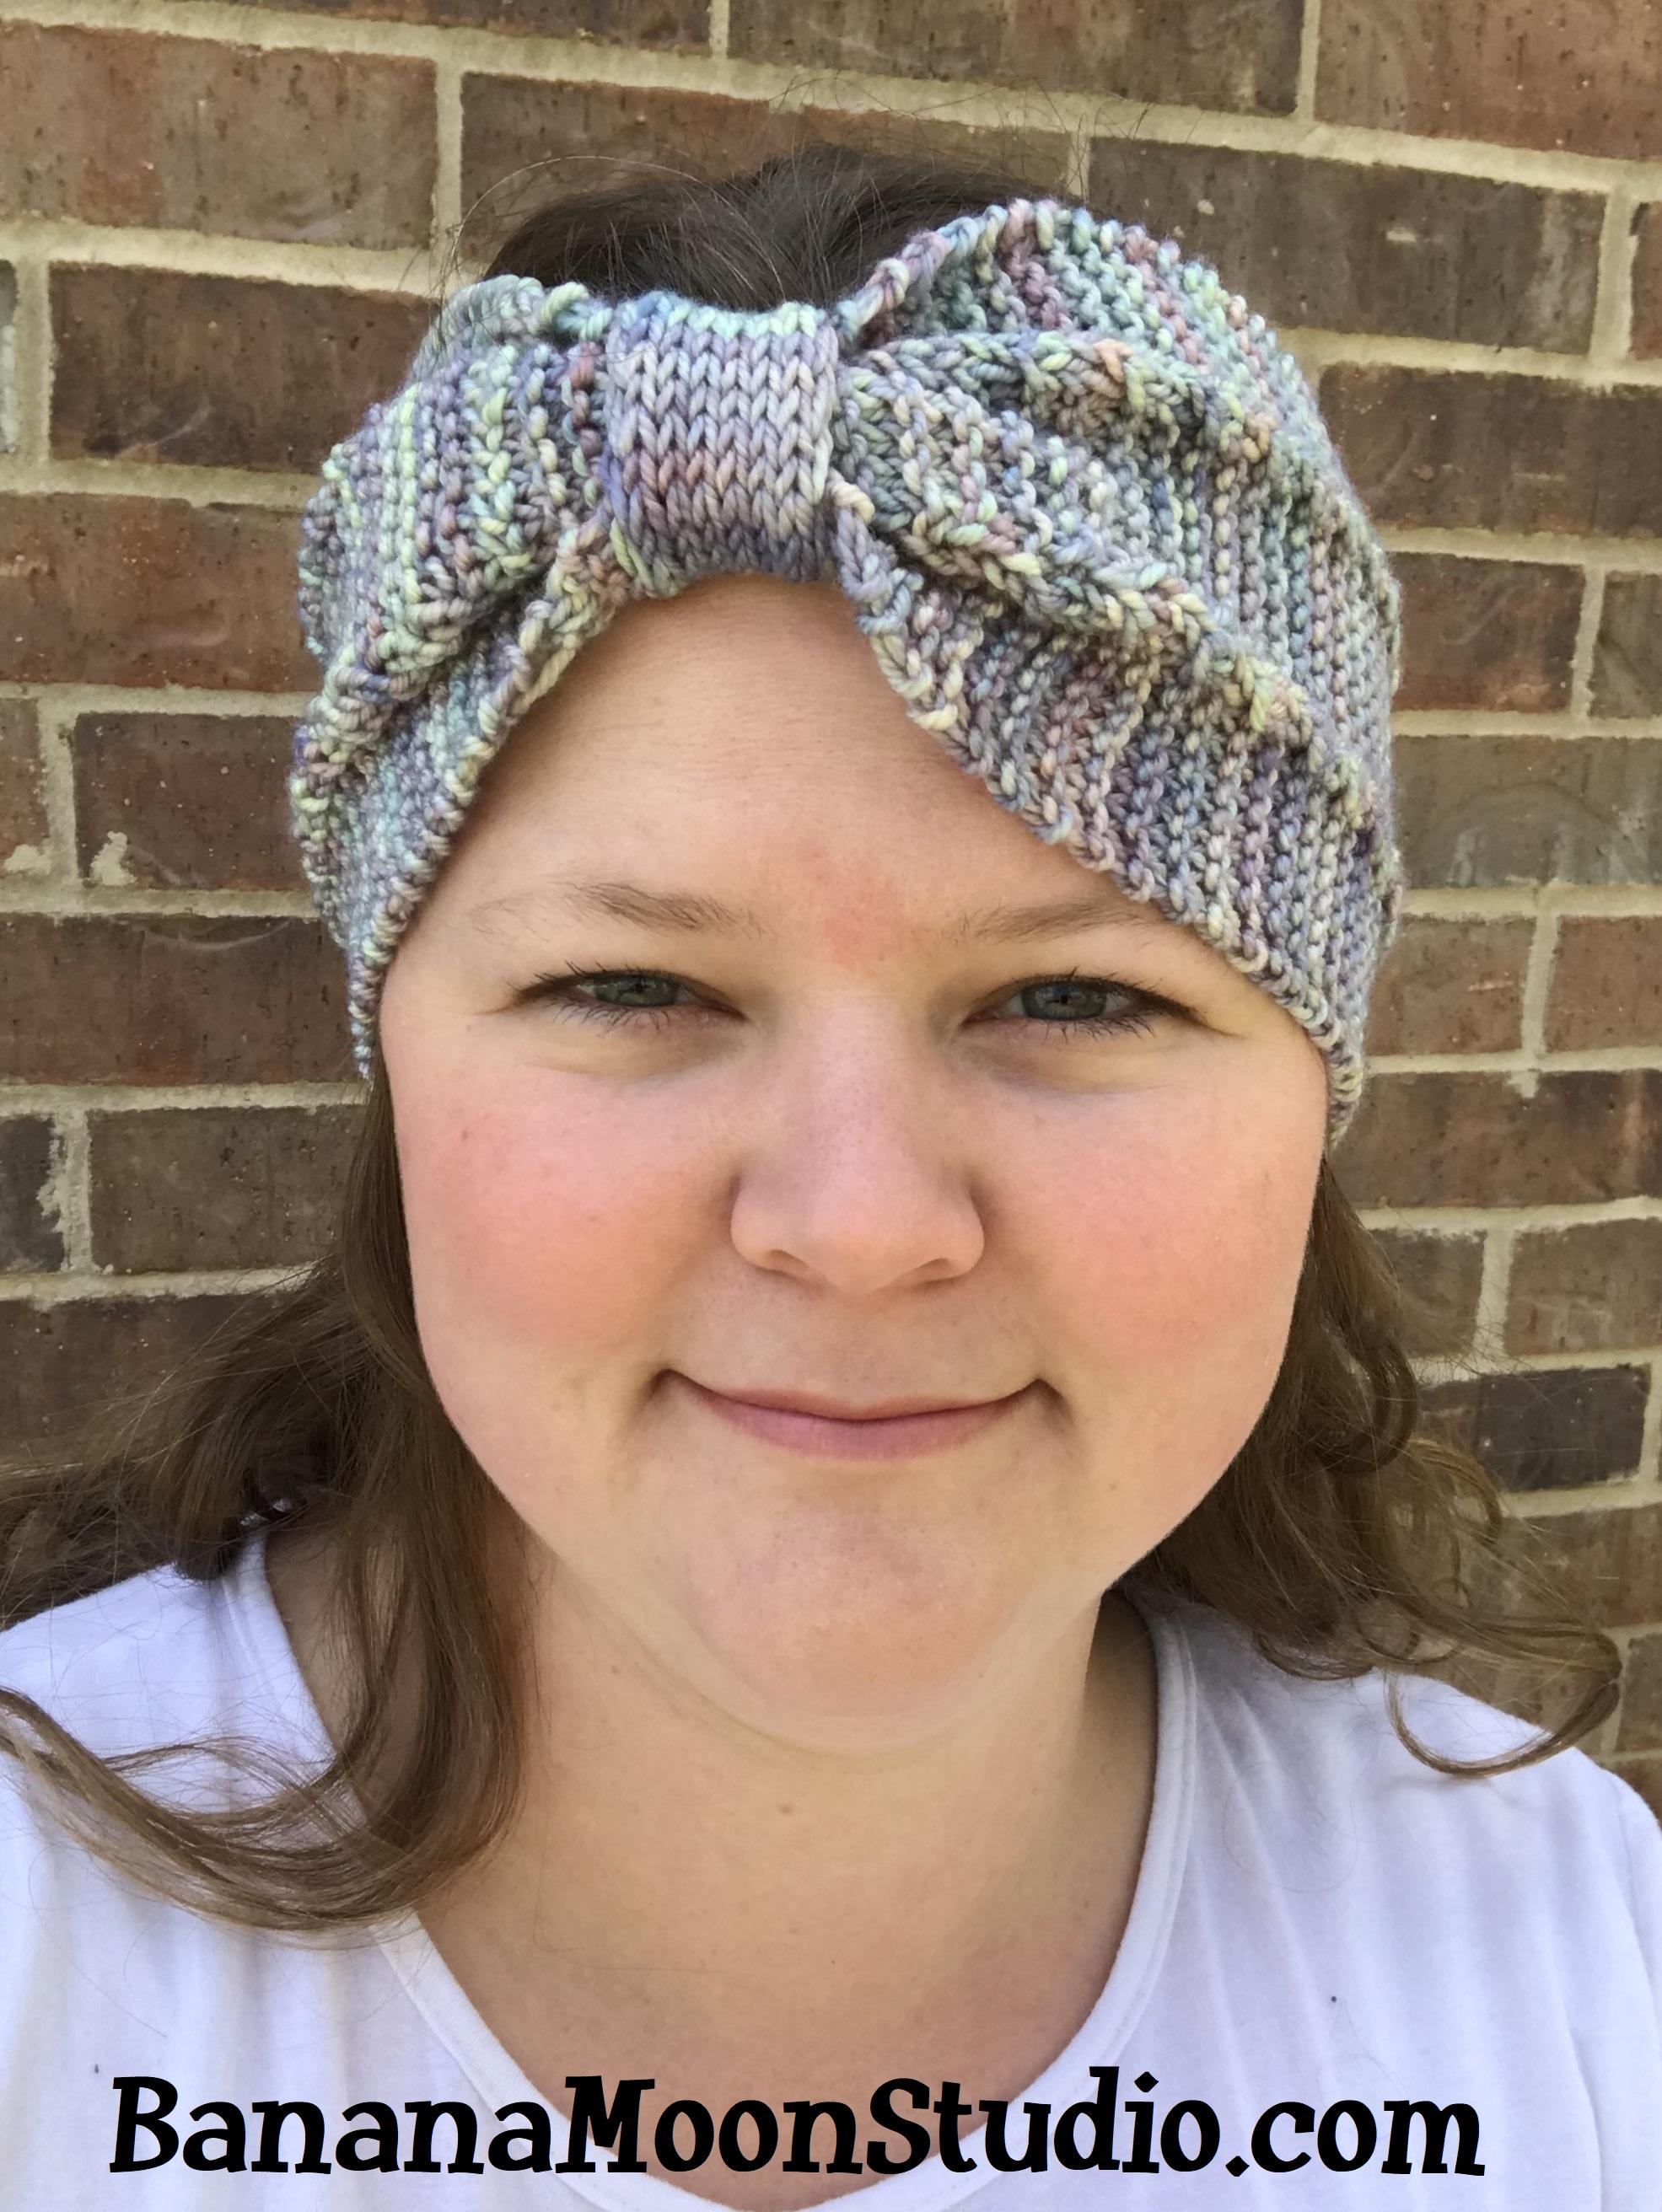 Knit headband pattern by April Garwood of Banana Moon Studio 7